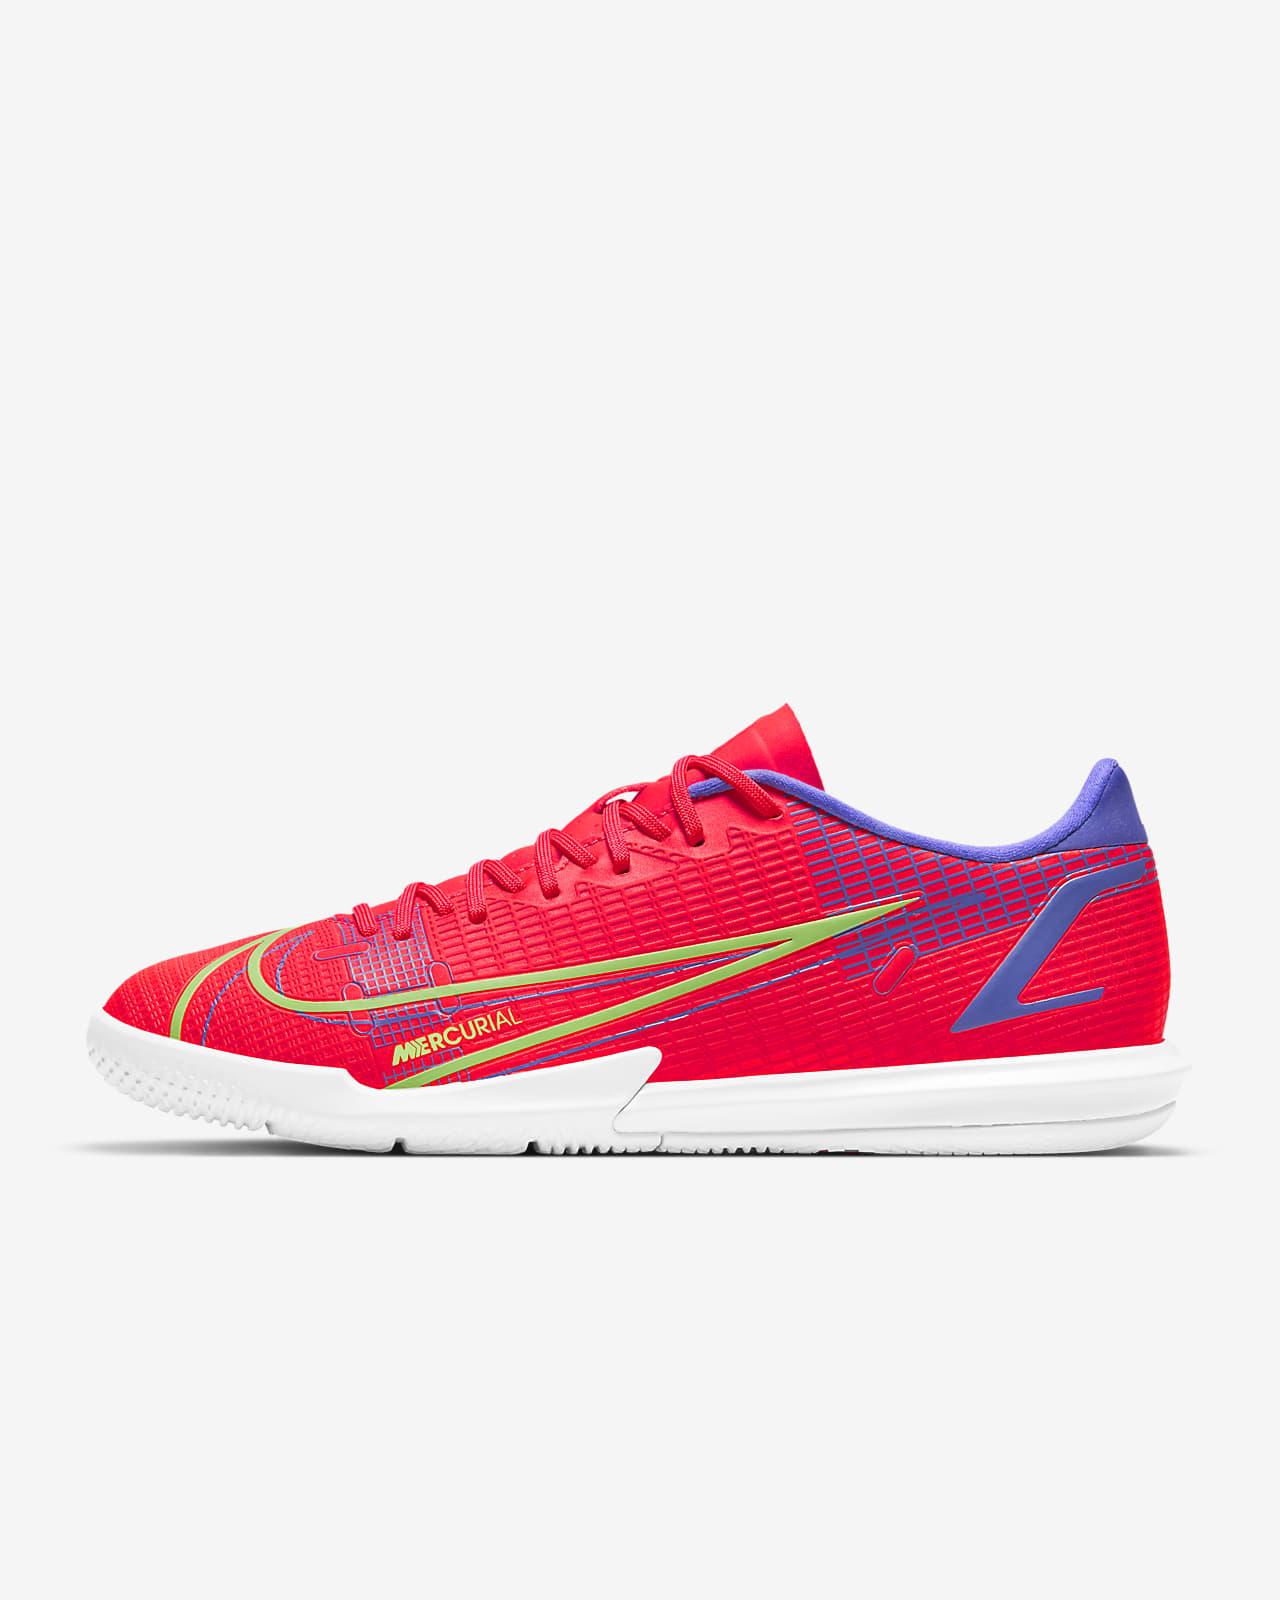 Nike Vapor 14 Academy IC 男/女室内球场足球鞋